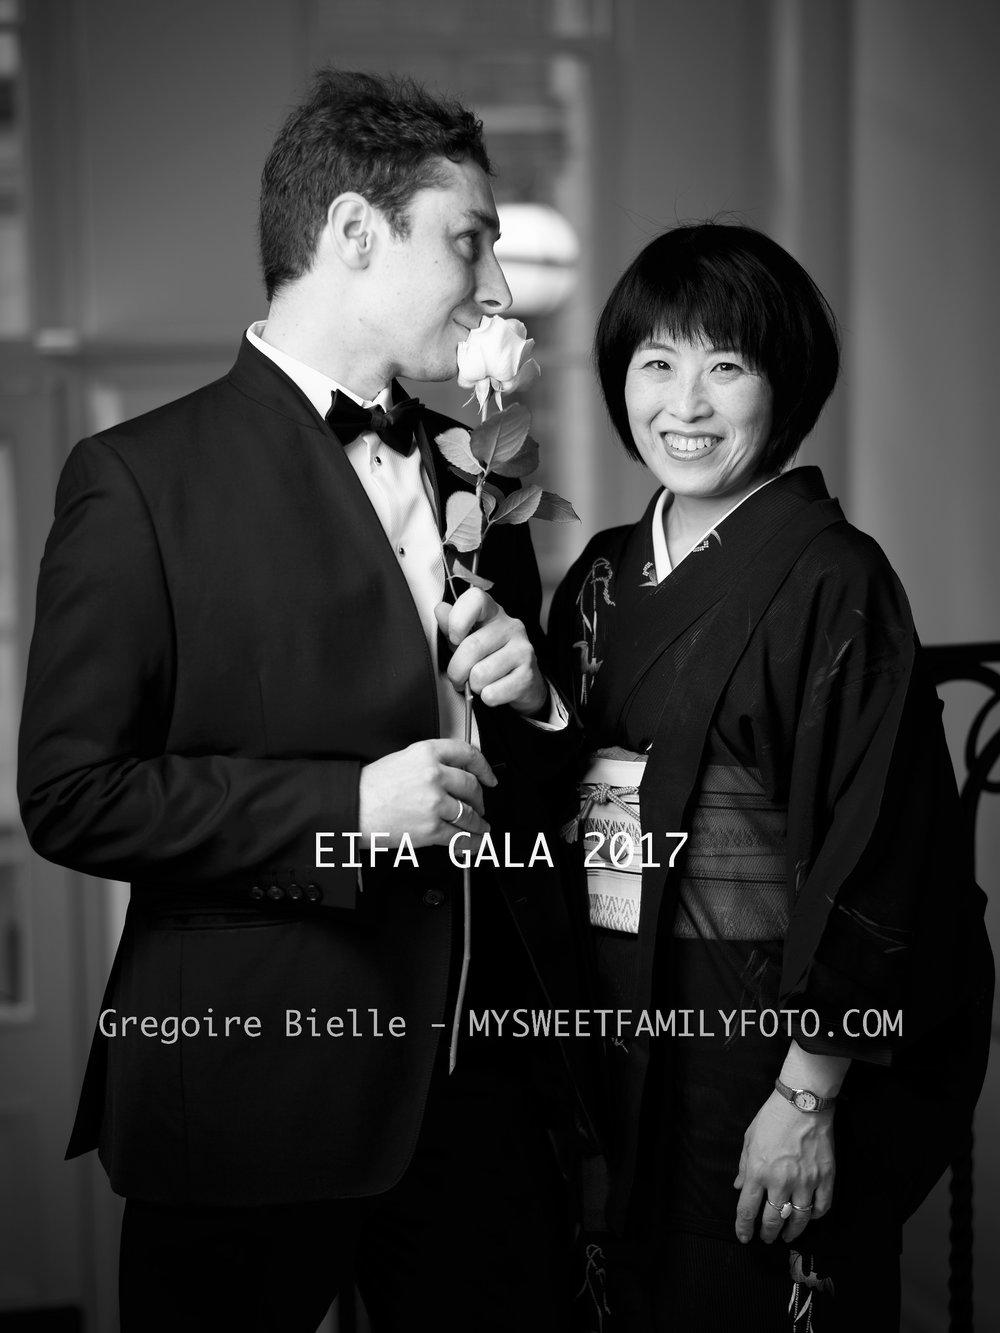 EIFA GALA 1009.jpg